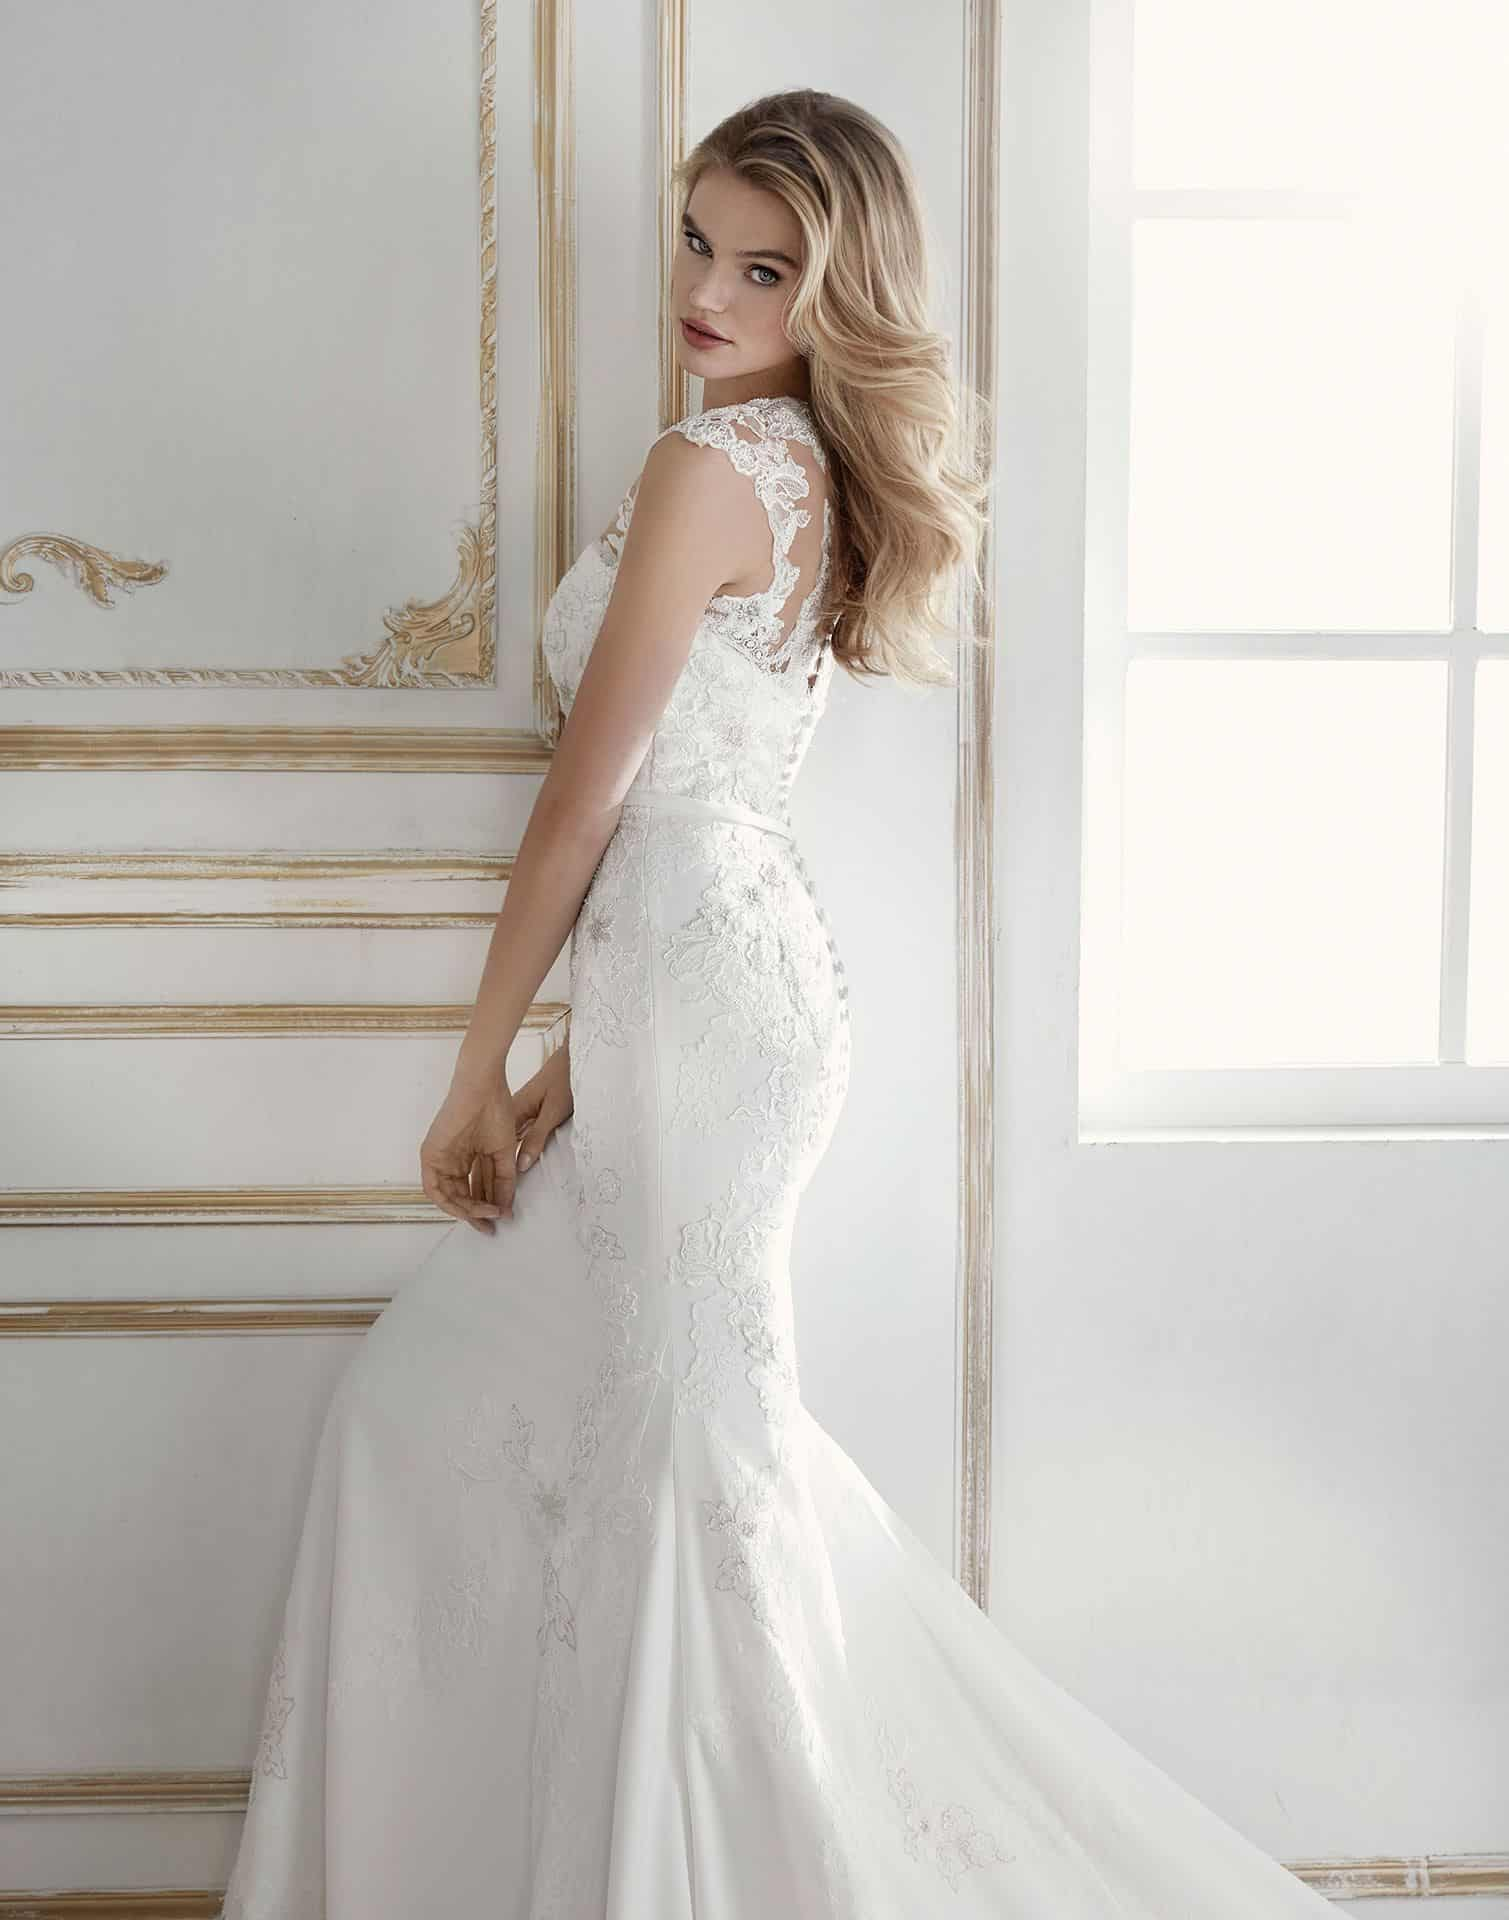 Wedding Dresses Gallery 39